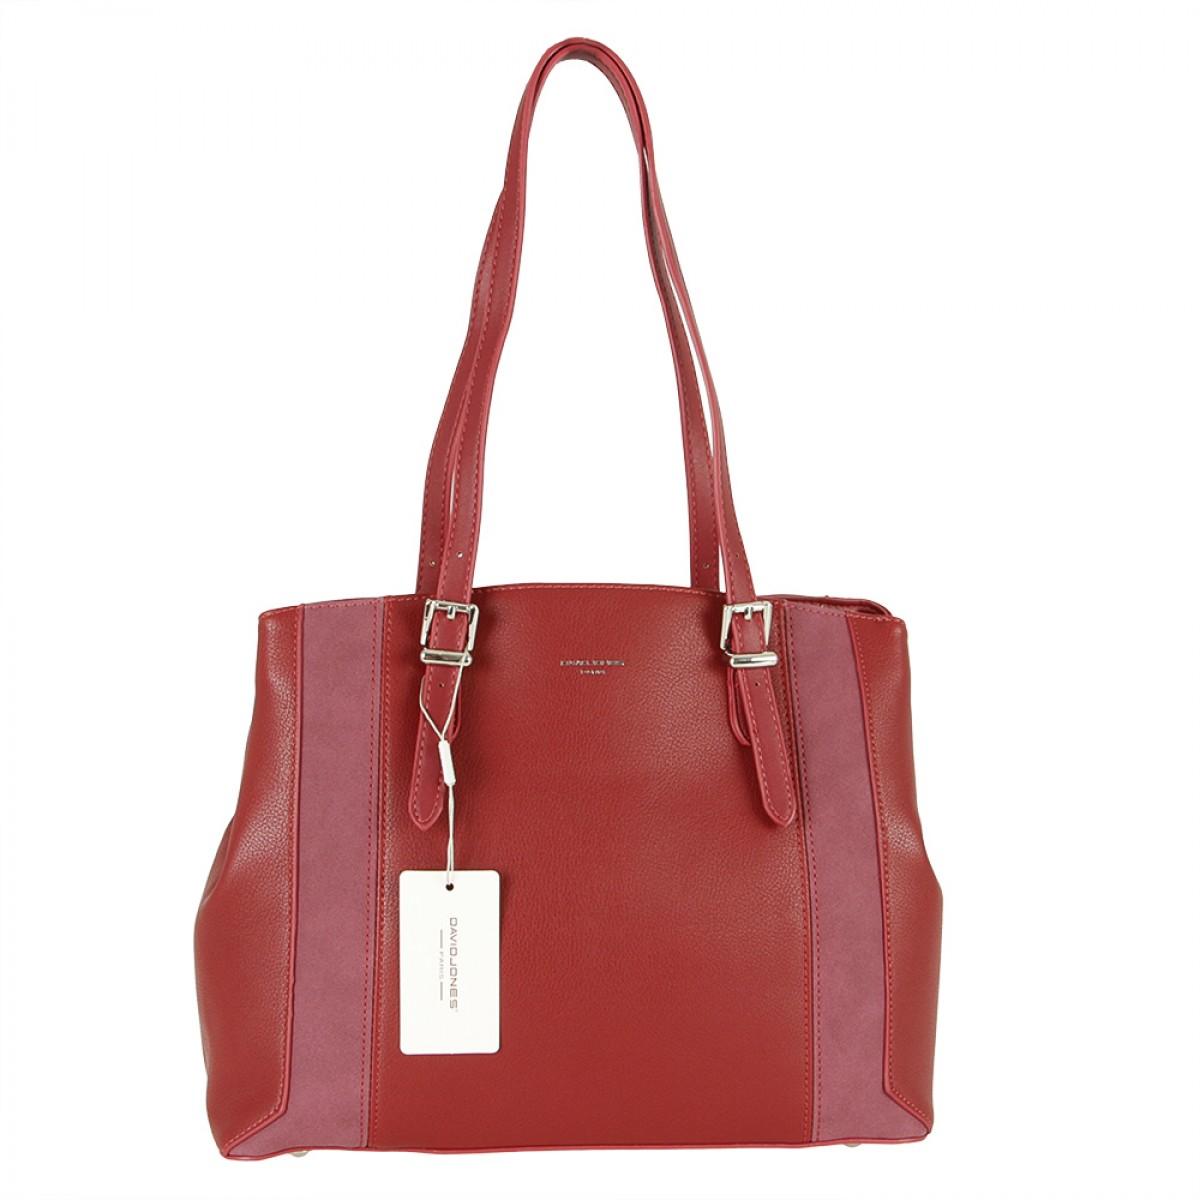 Жіноча сумка David Jones 6175-2 DARK RED